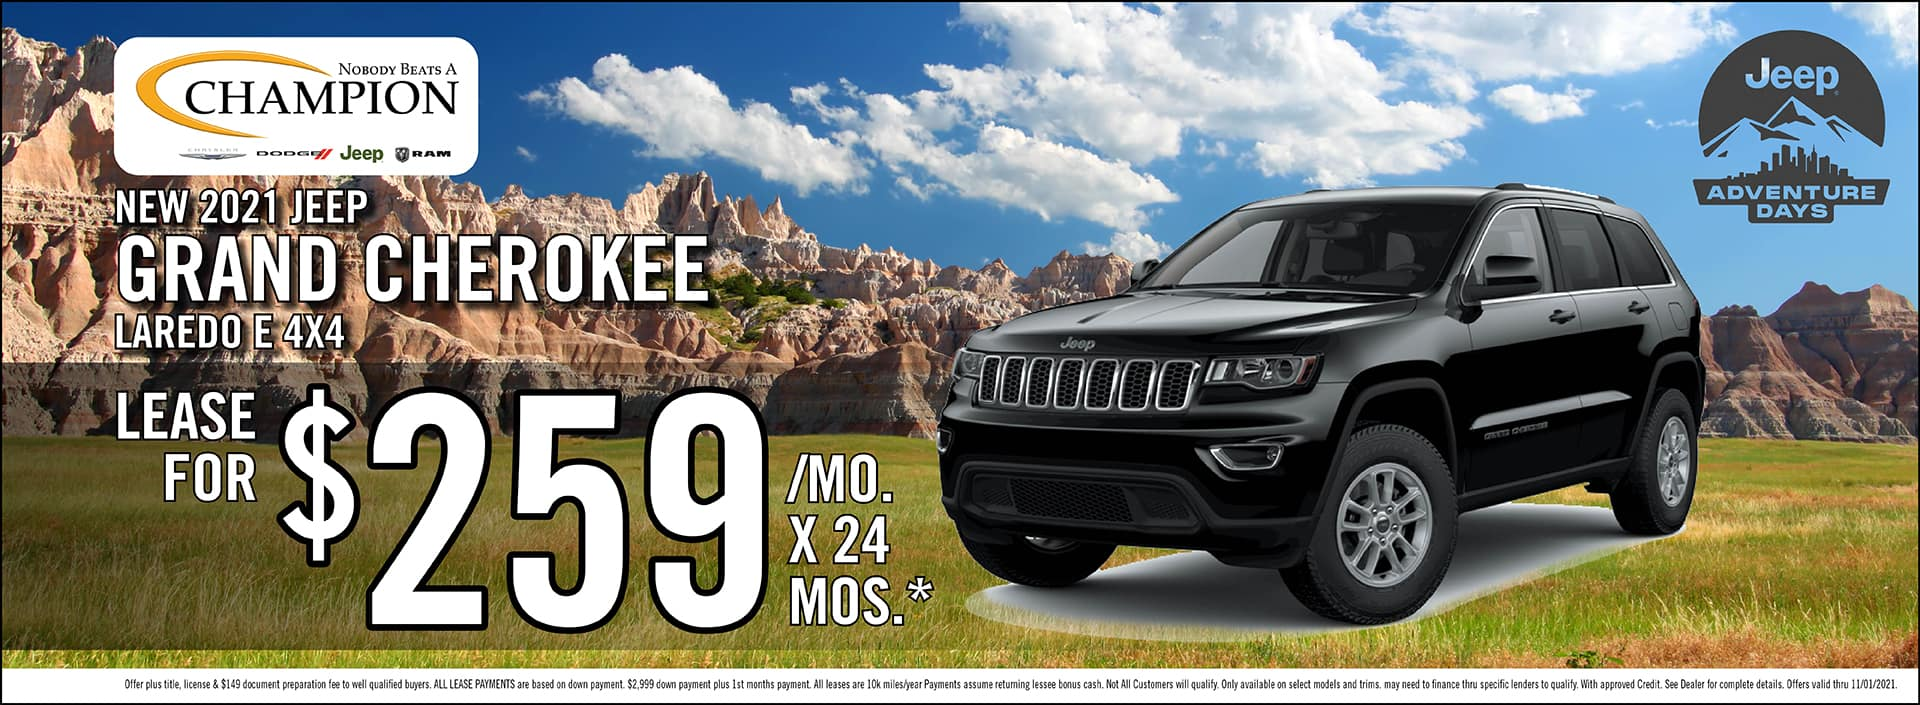 New 2021 Jeep Grand Chrerokee Laredo Offer